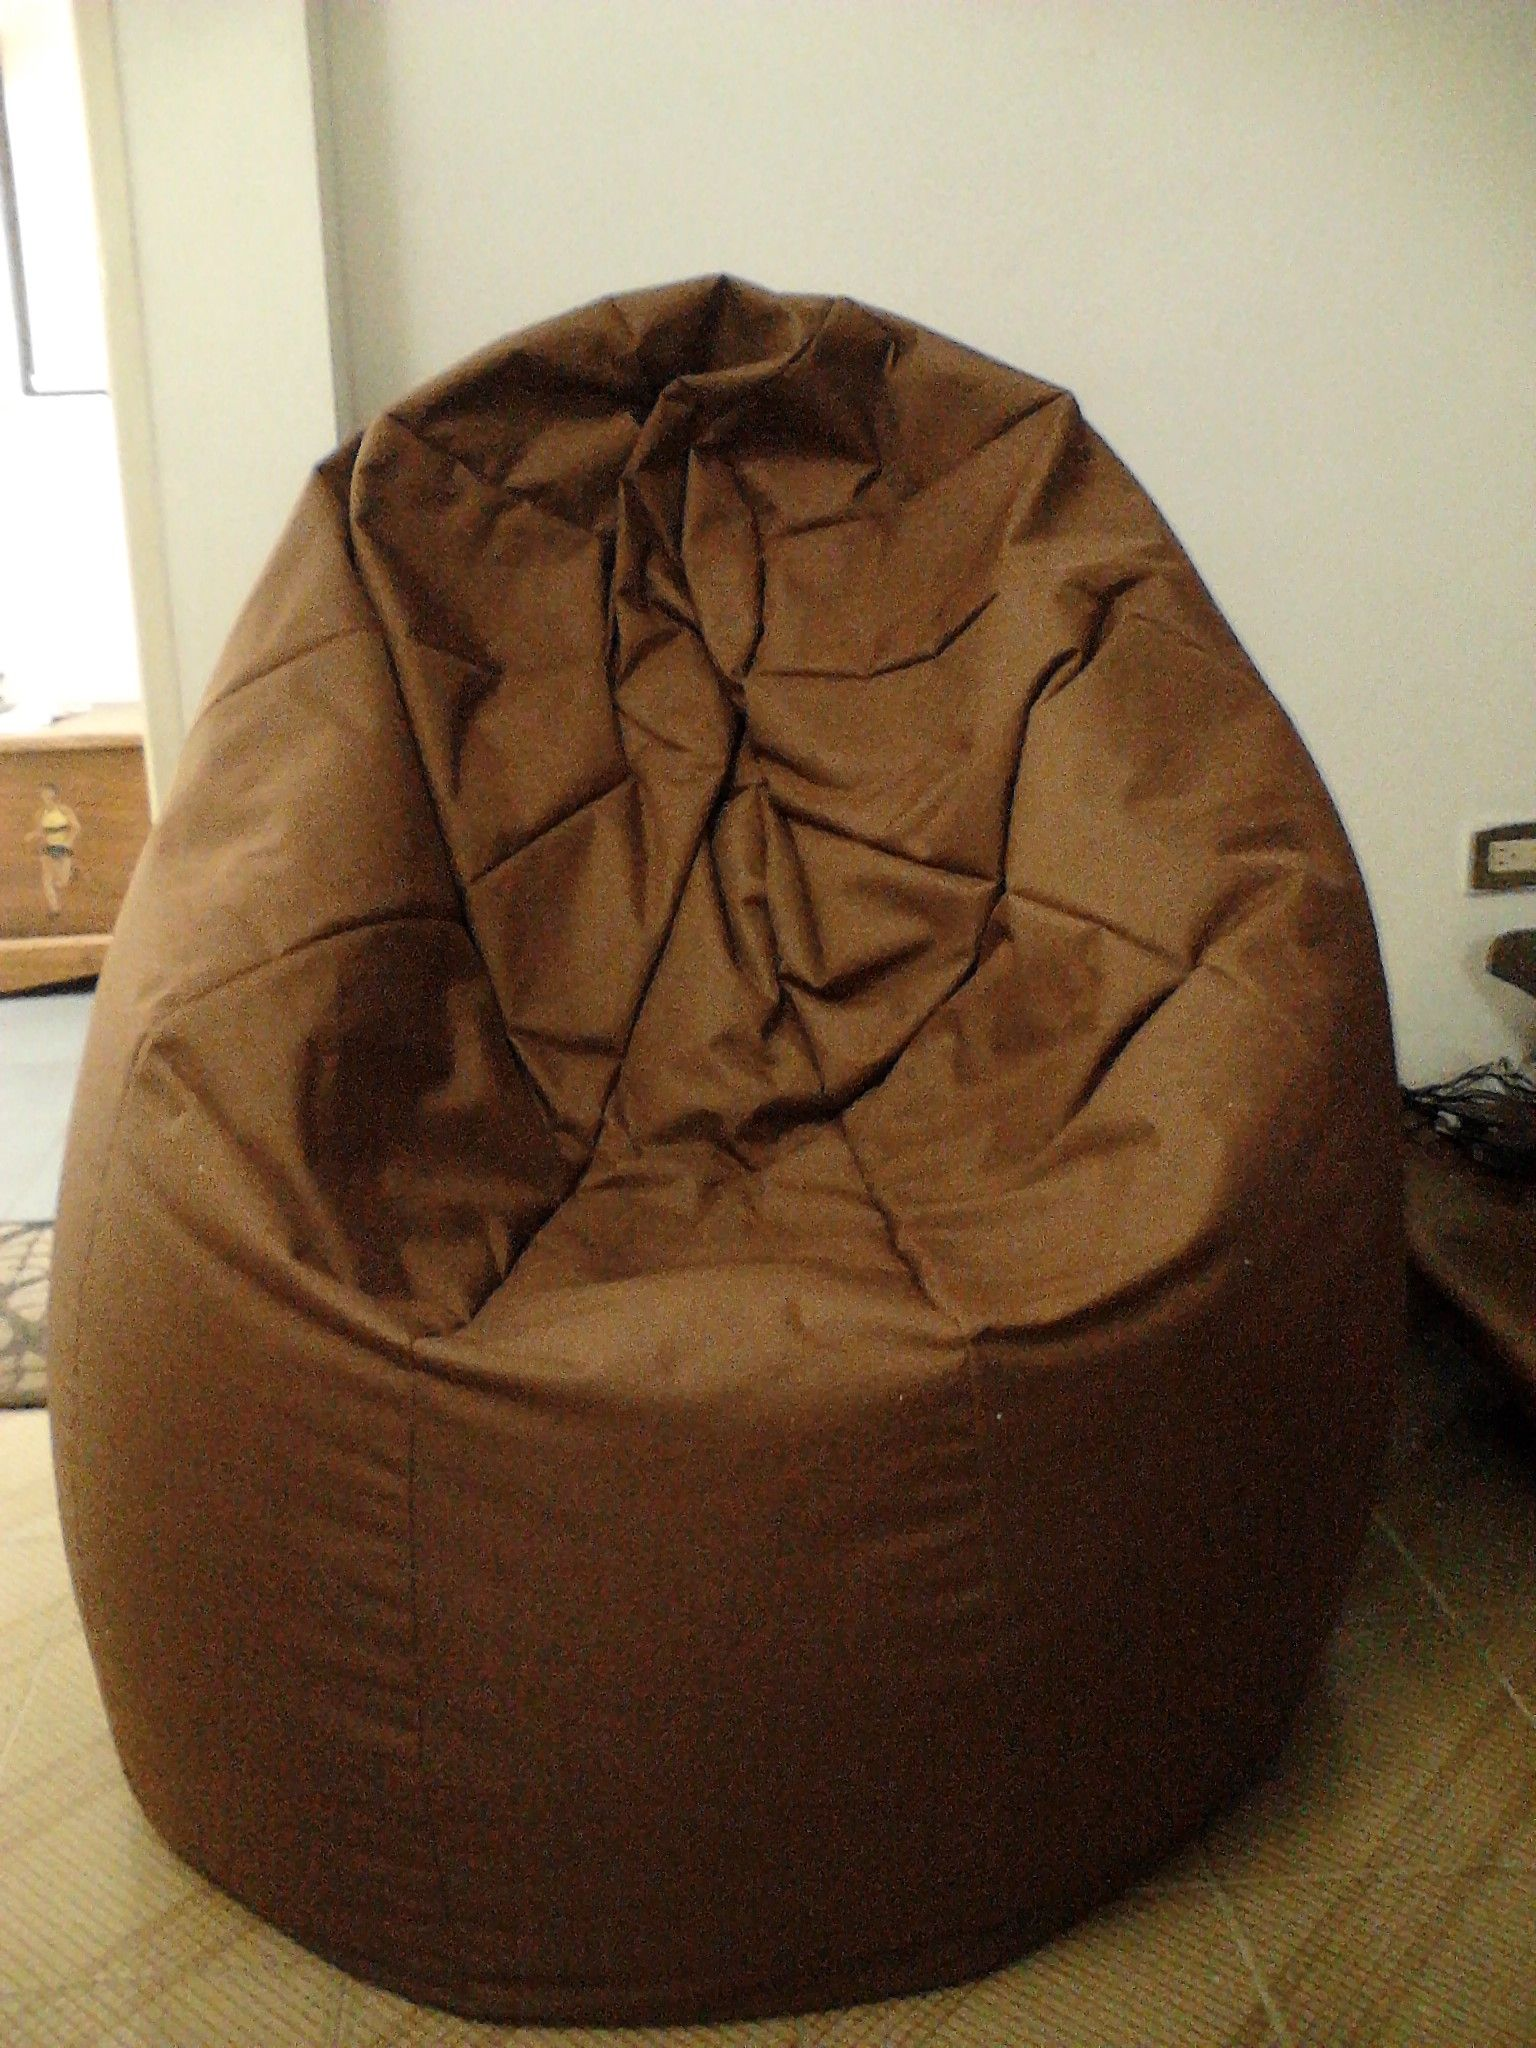 Puff tipo Pera/ Beanbag chair 5.5 kg color marron / brown